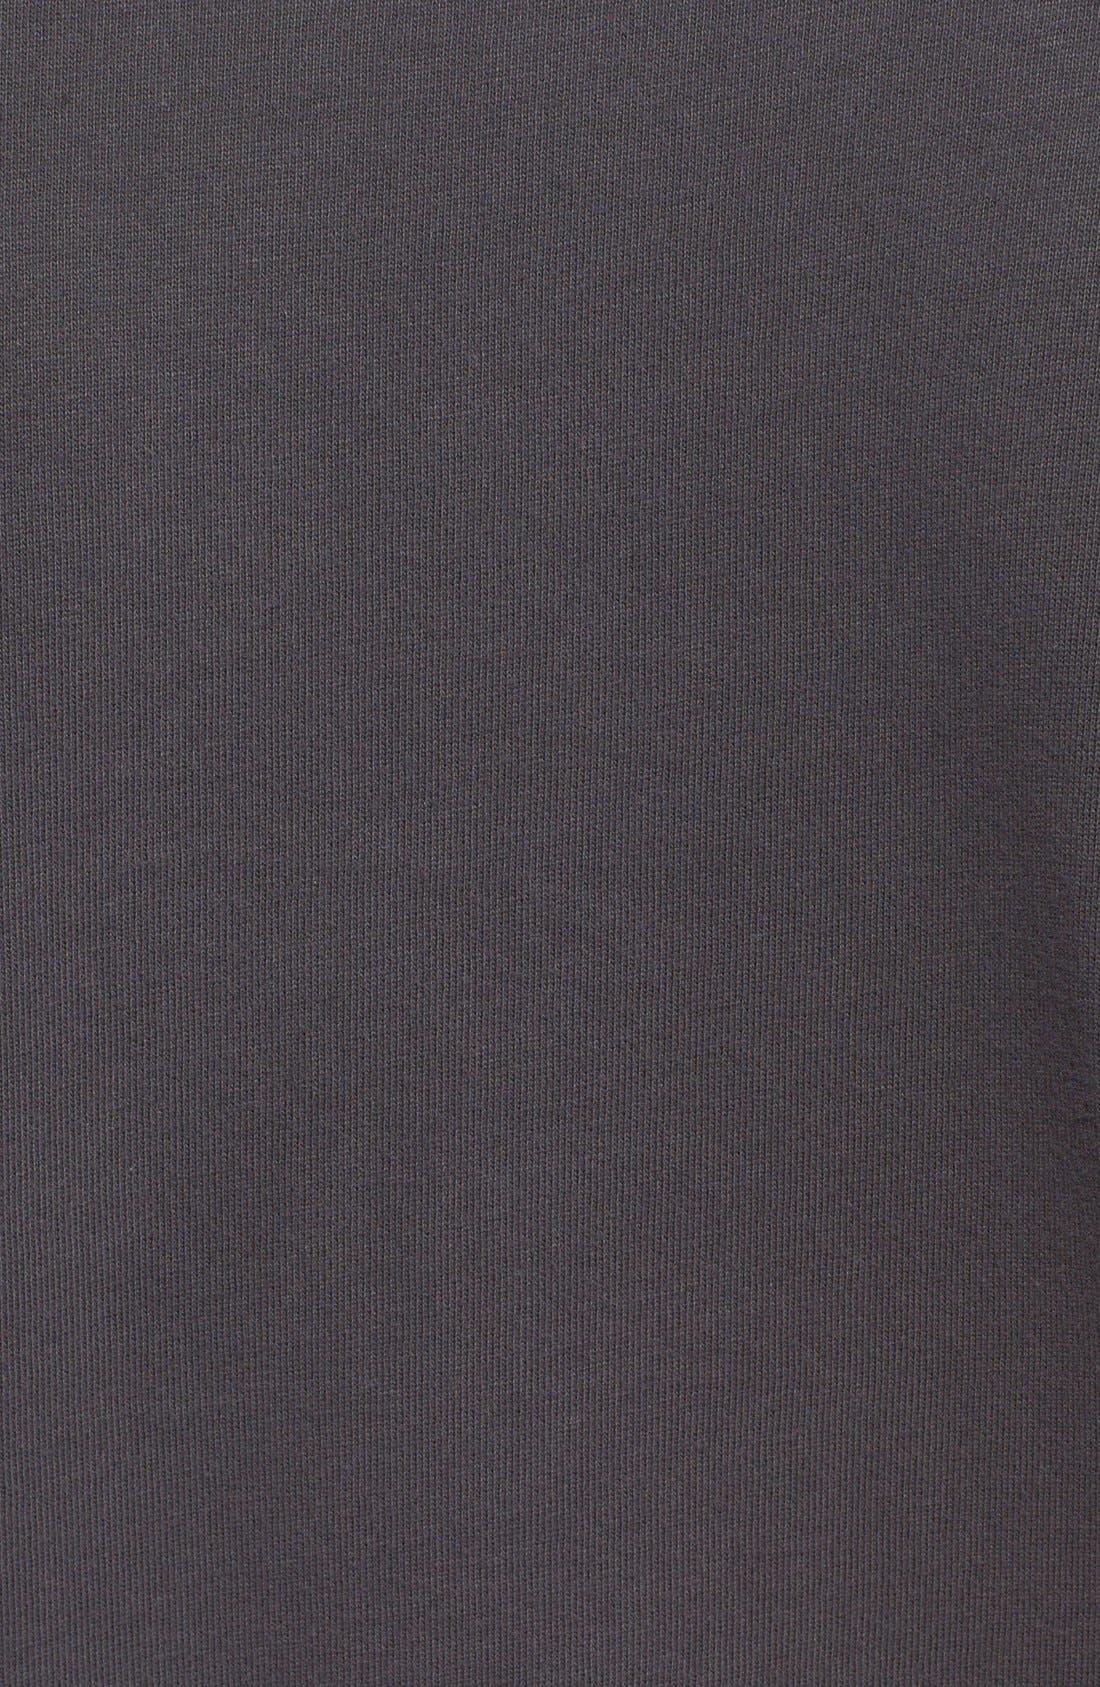 Levi's Vintage Clothing '1950s' Pocket T-Shirt,                             Alternate thumbnail 5, color,                             Black